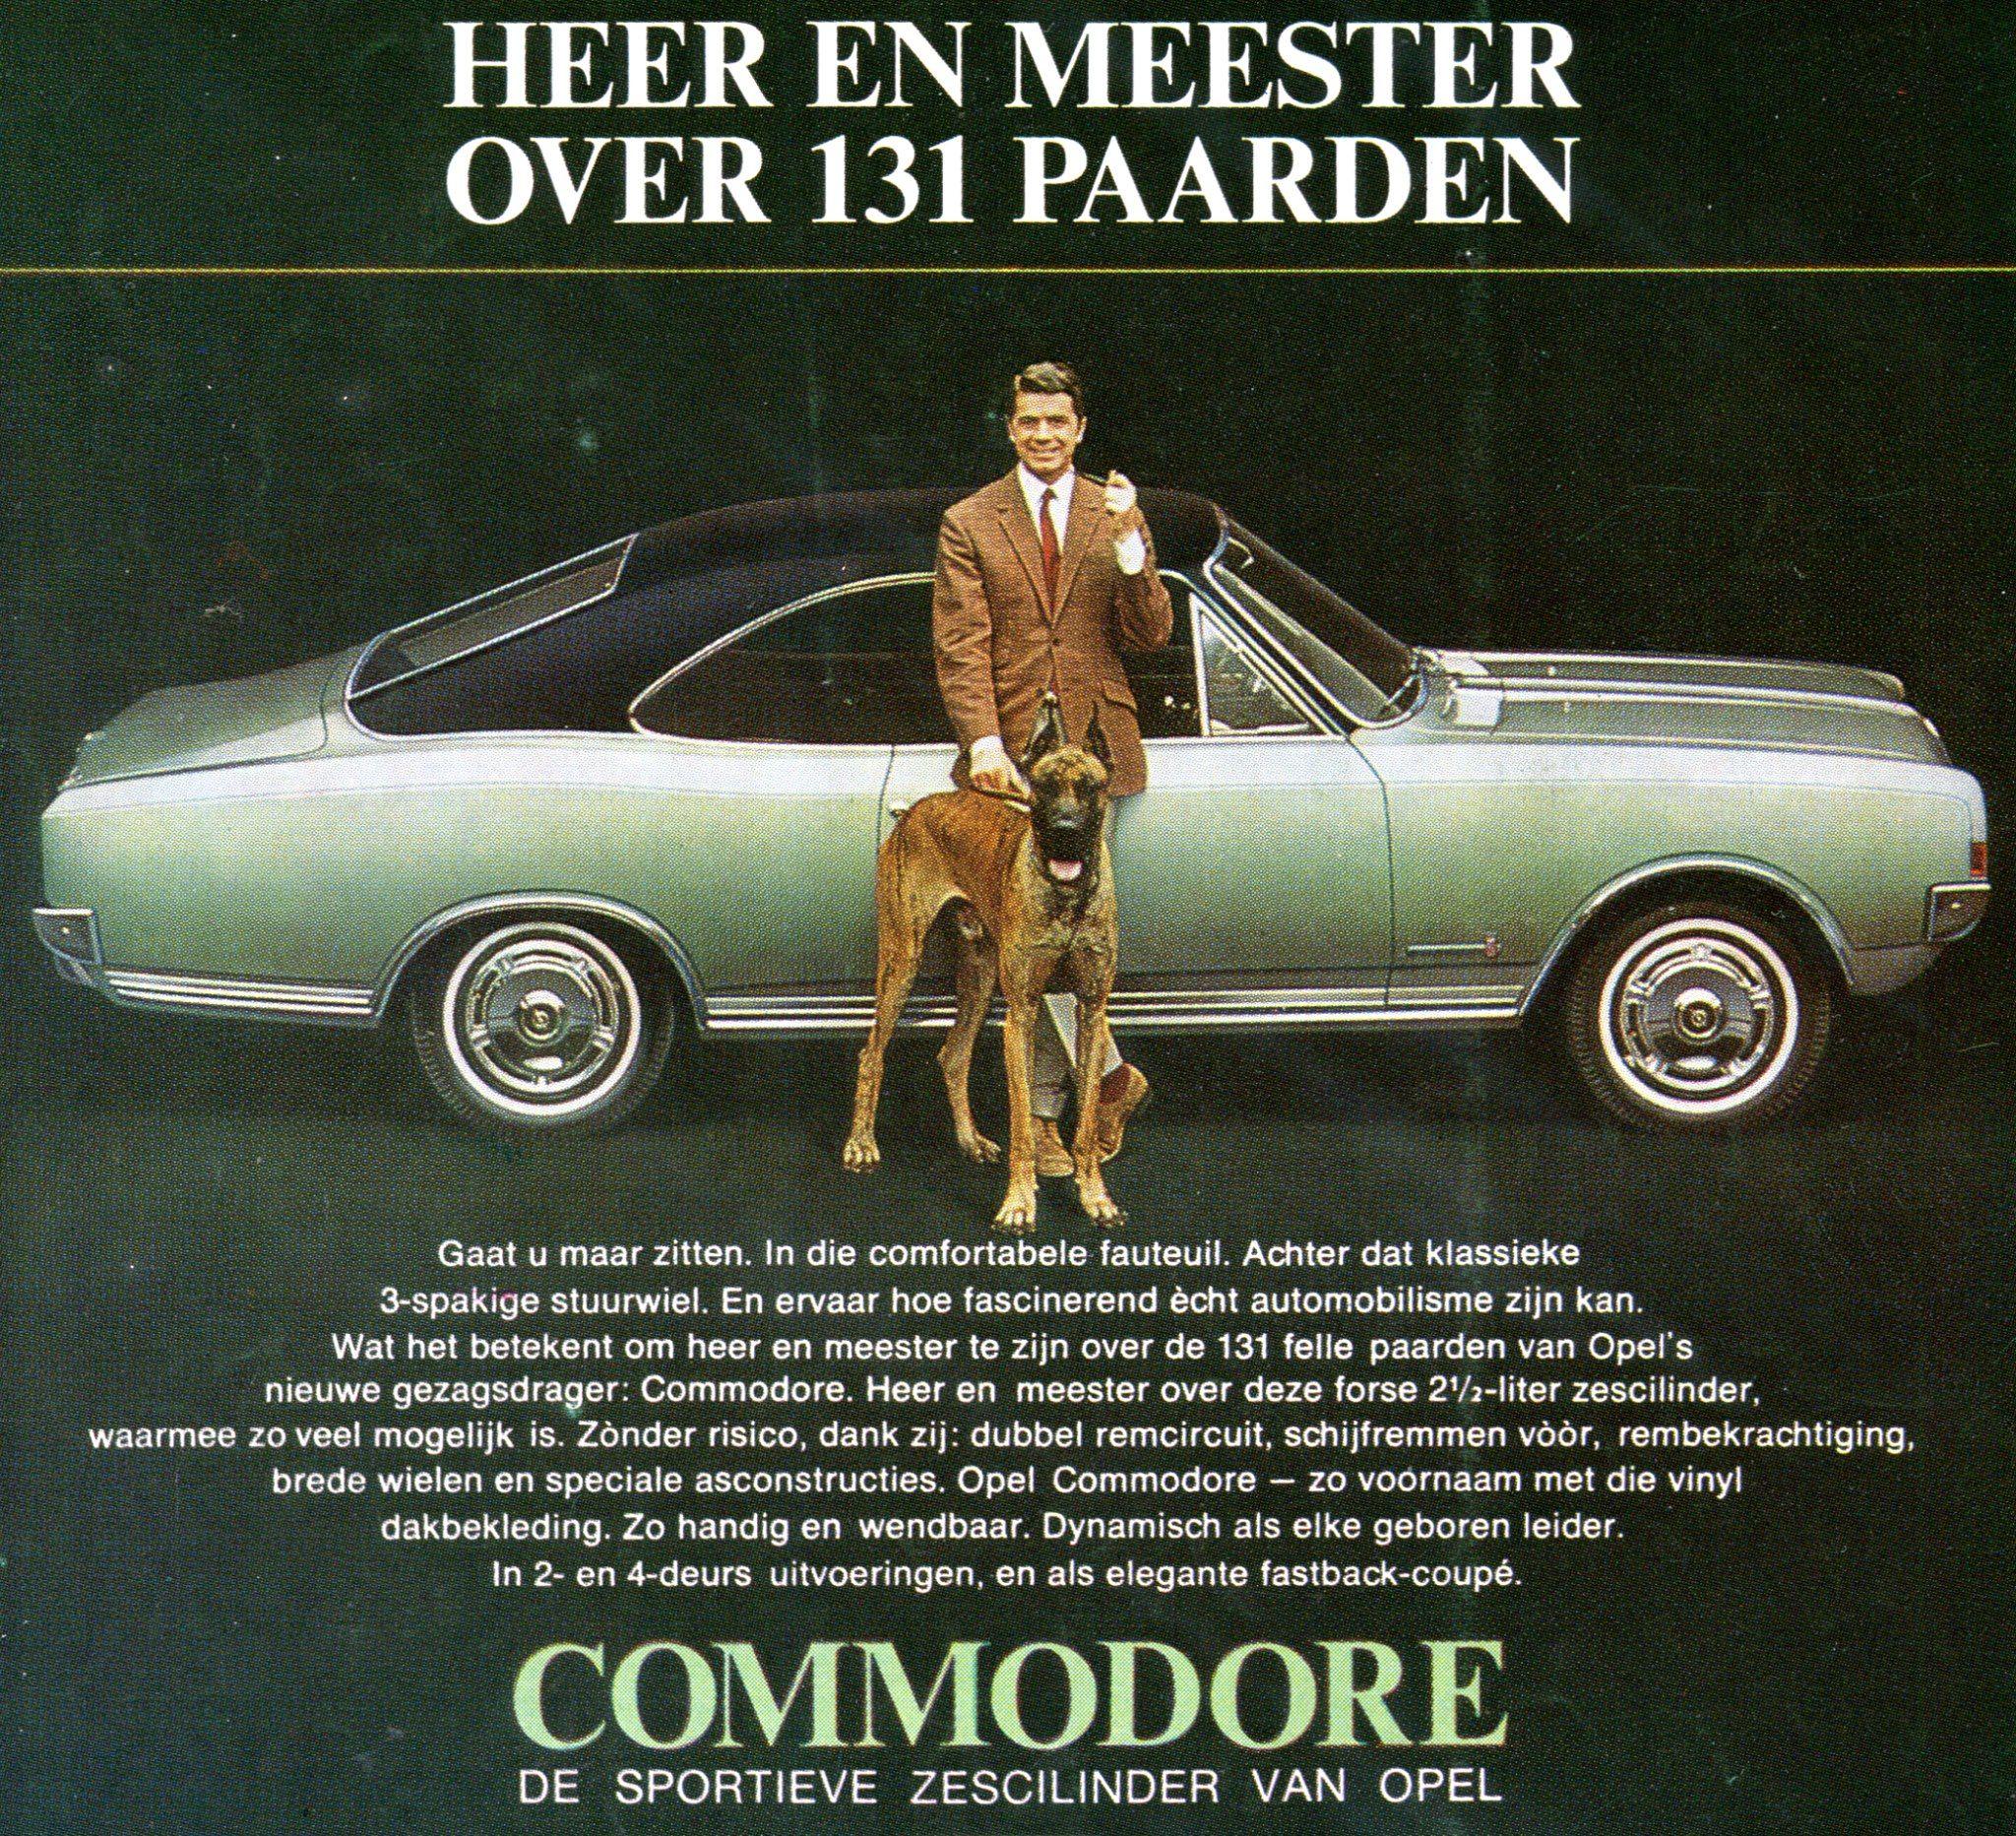 Dutch commercial Opel Commodore | Great Danes Pinterest | Pinterest